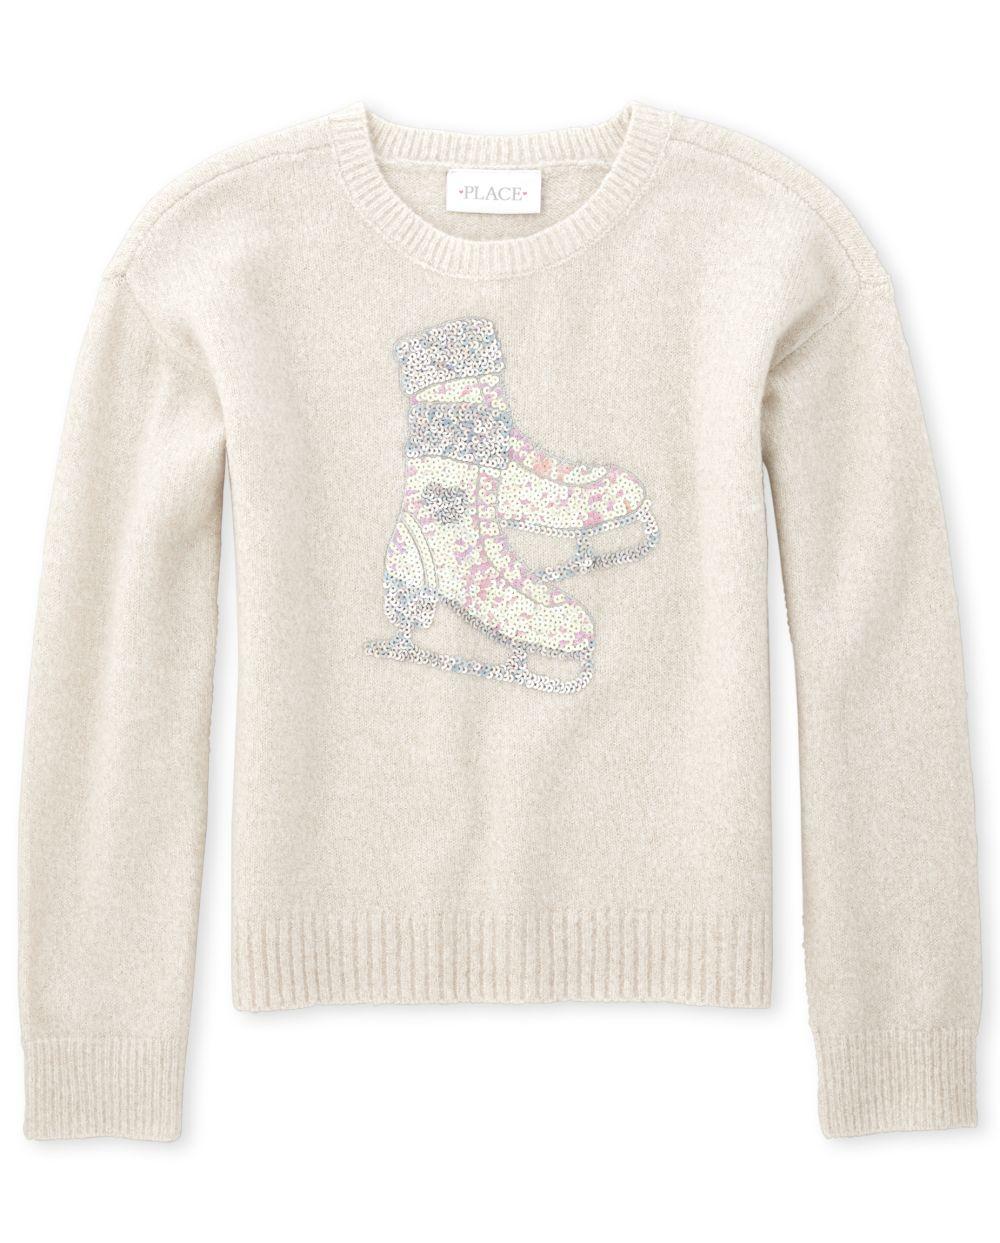 Girls Embellished Sweater